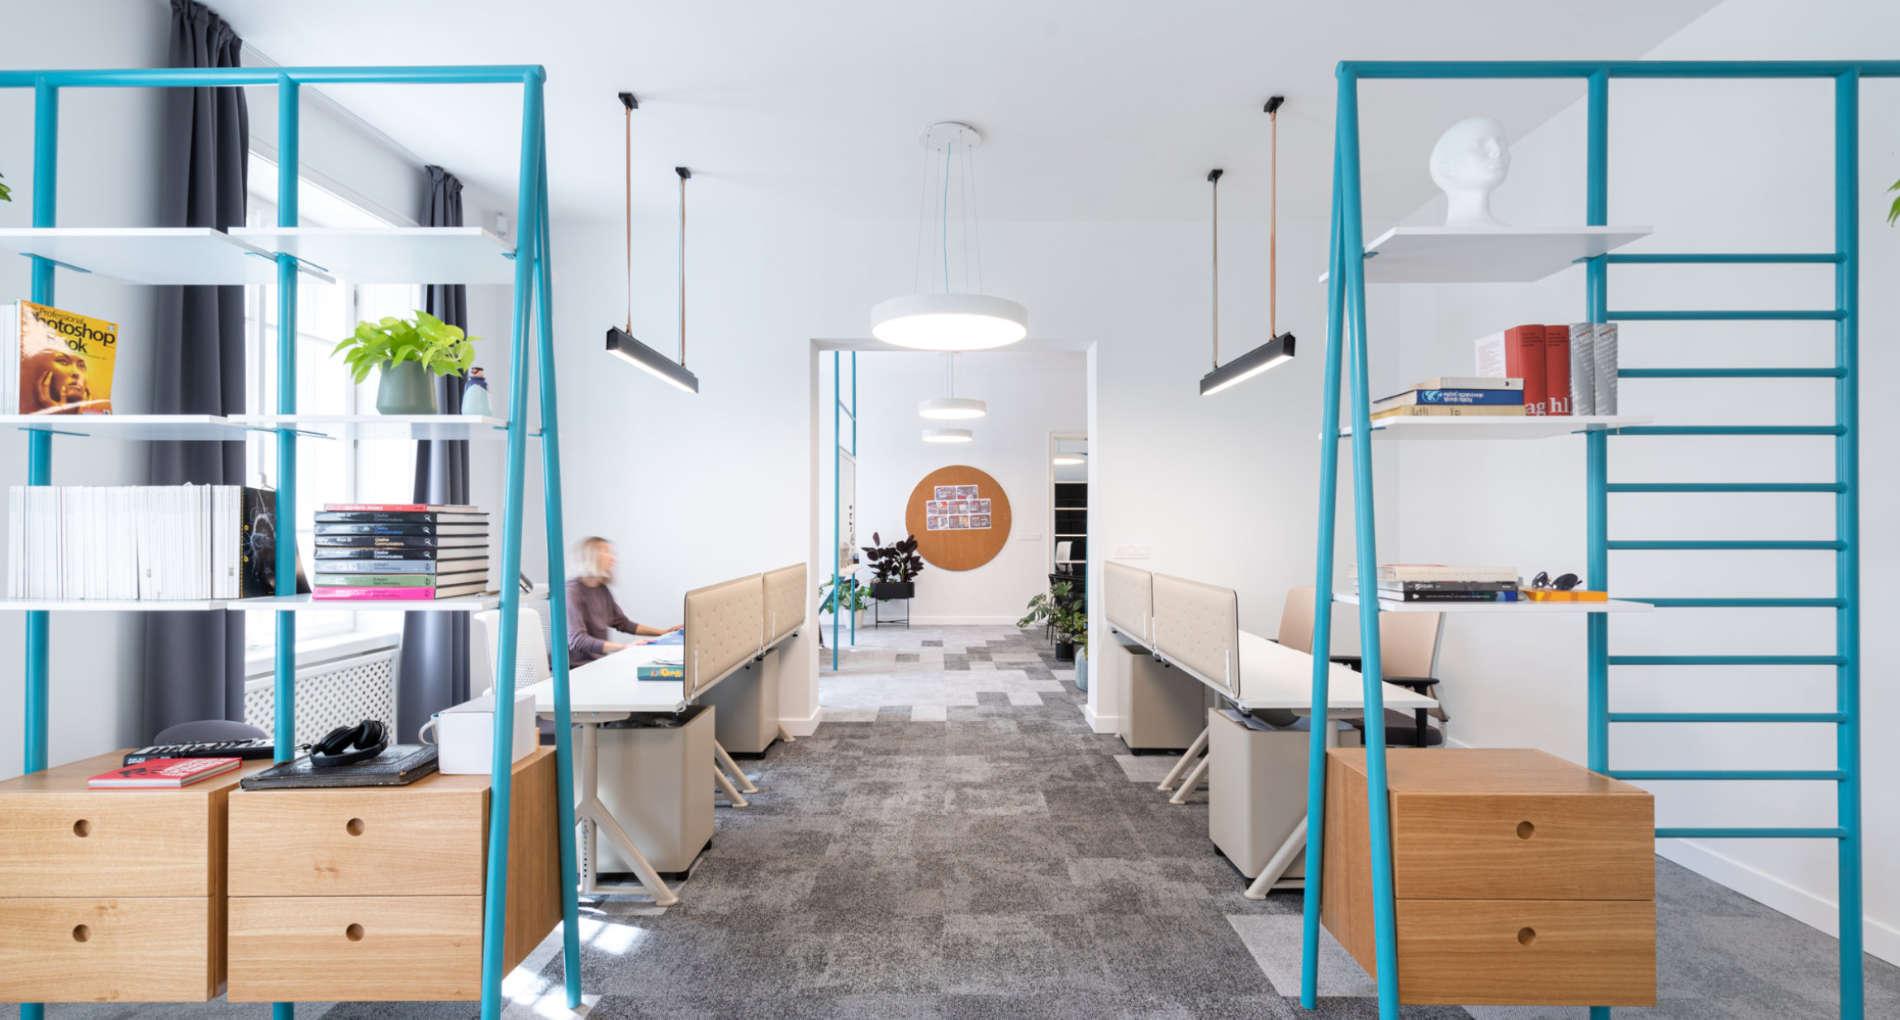 interior office design with arli led lights